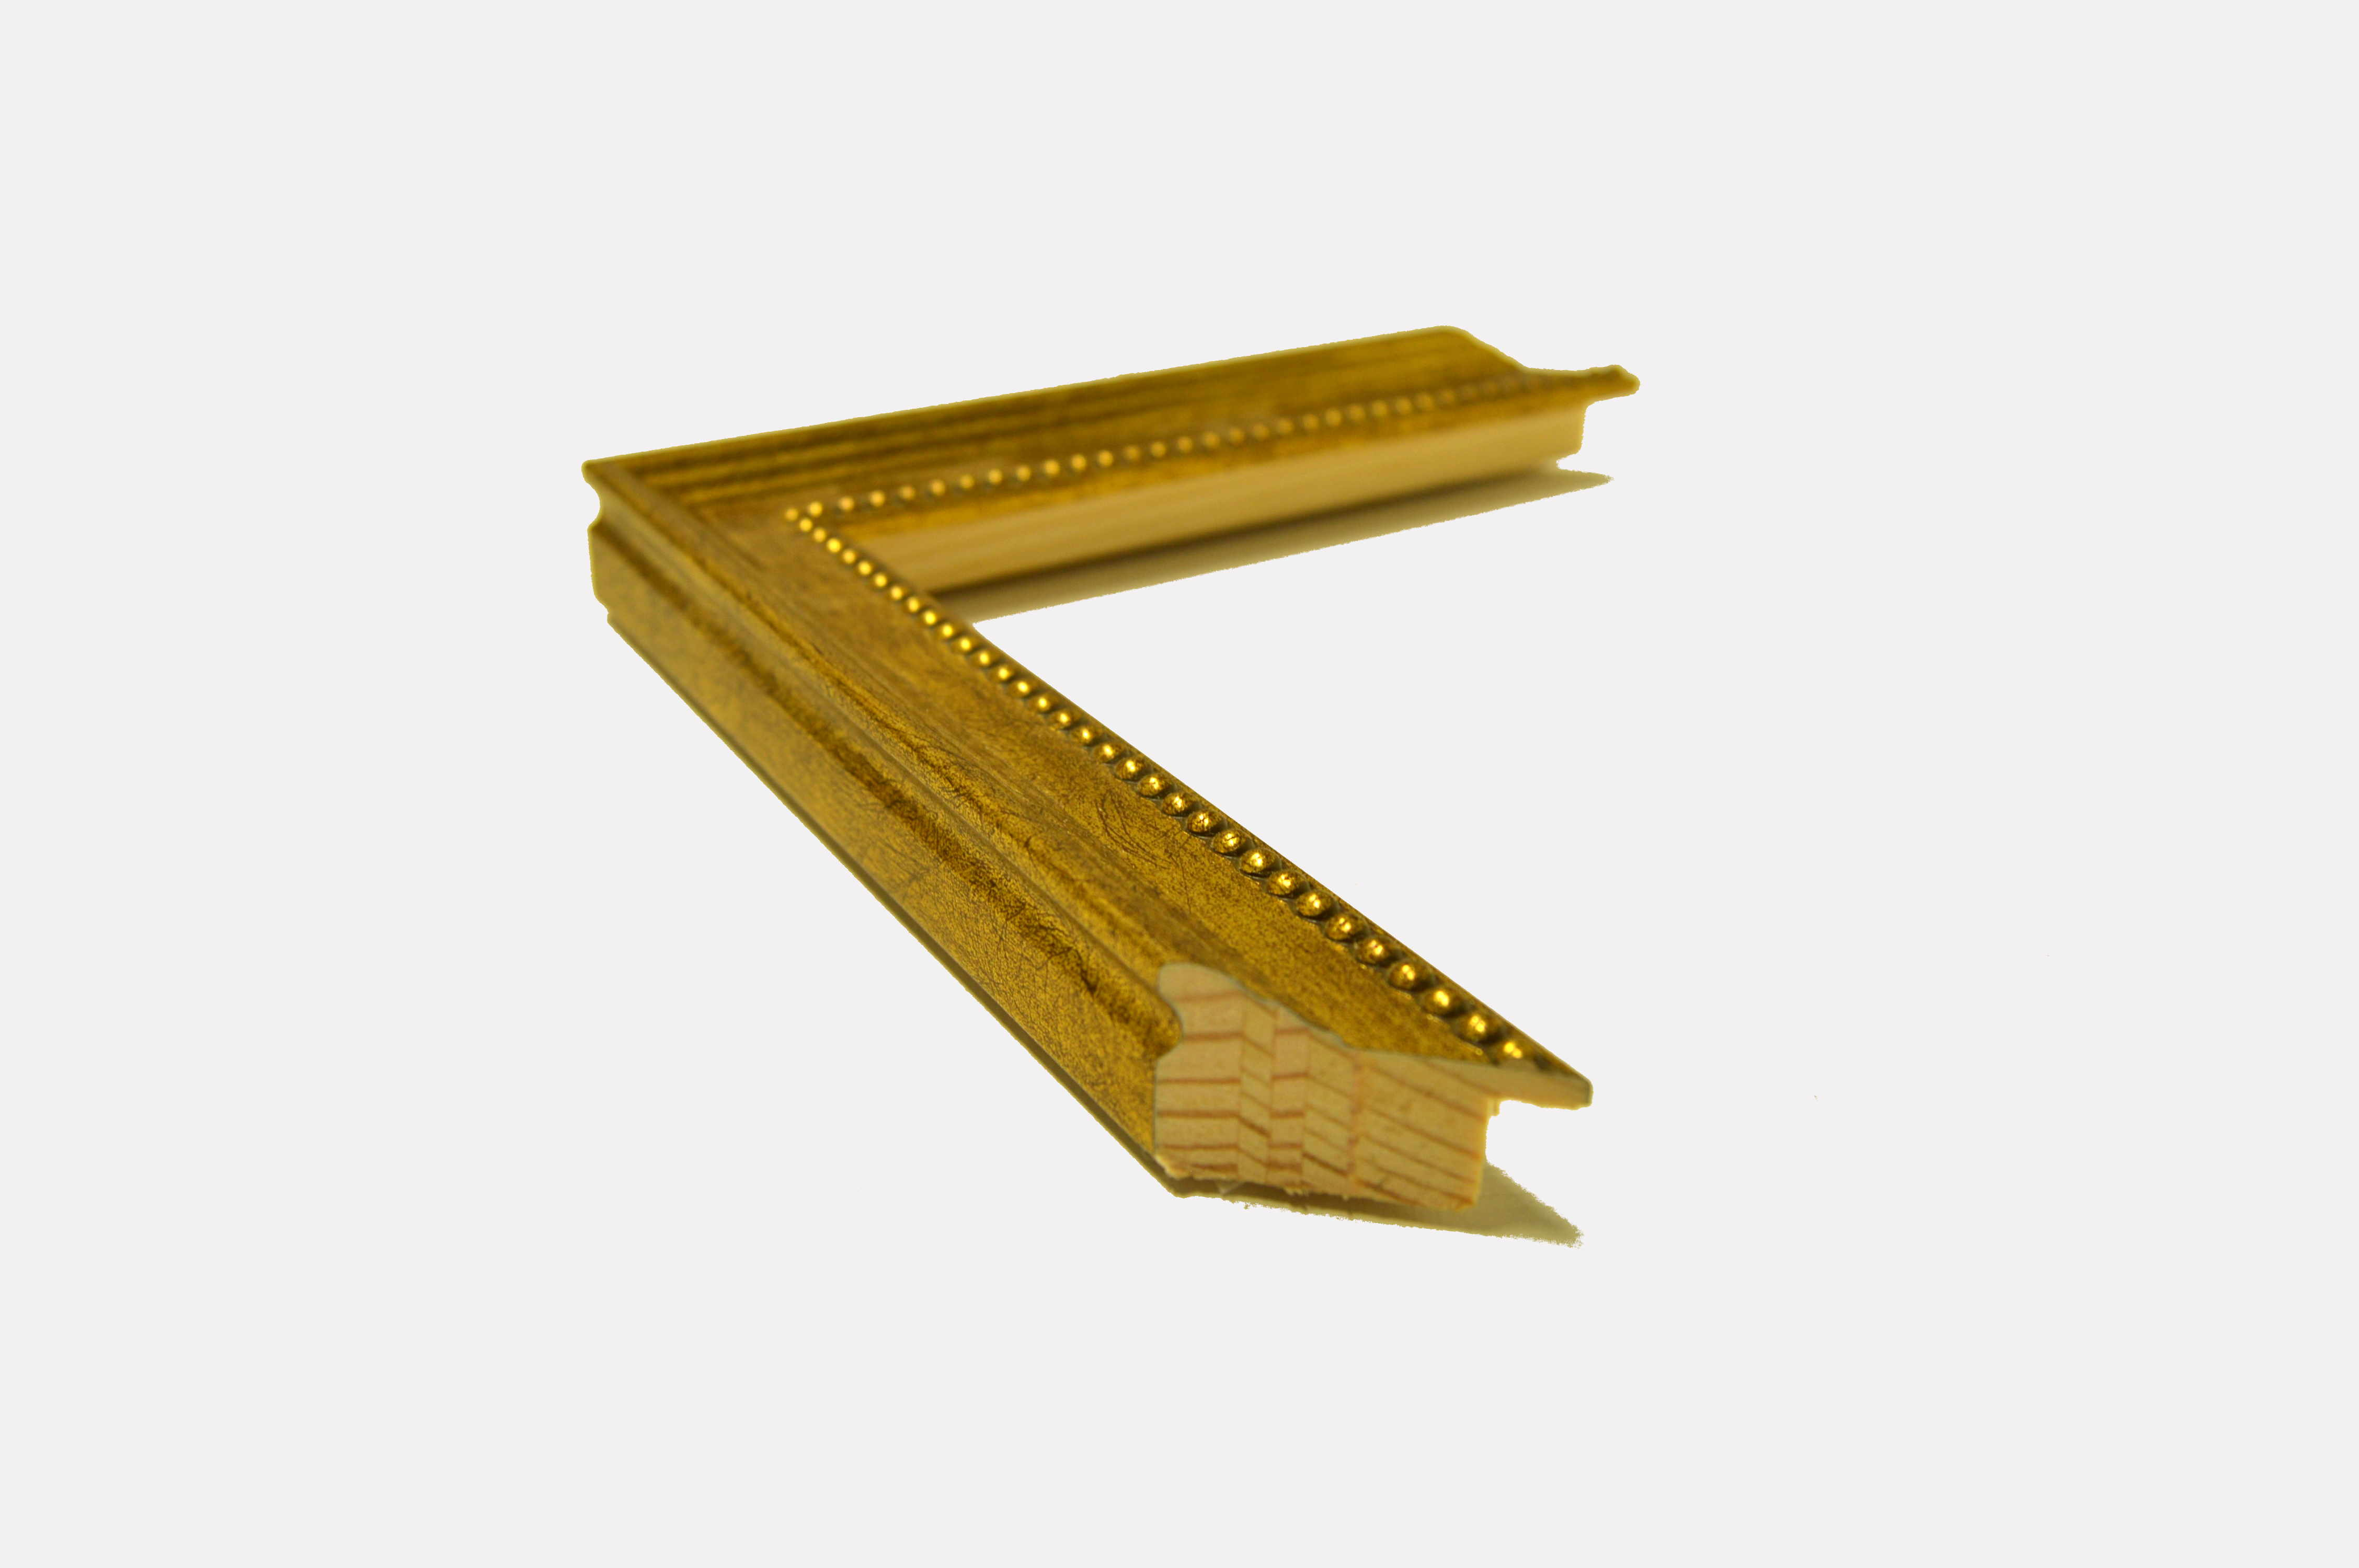 00751-550-OROperfil-ancho2.7cm